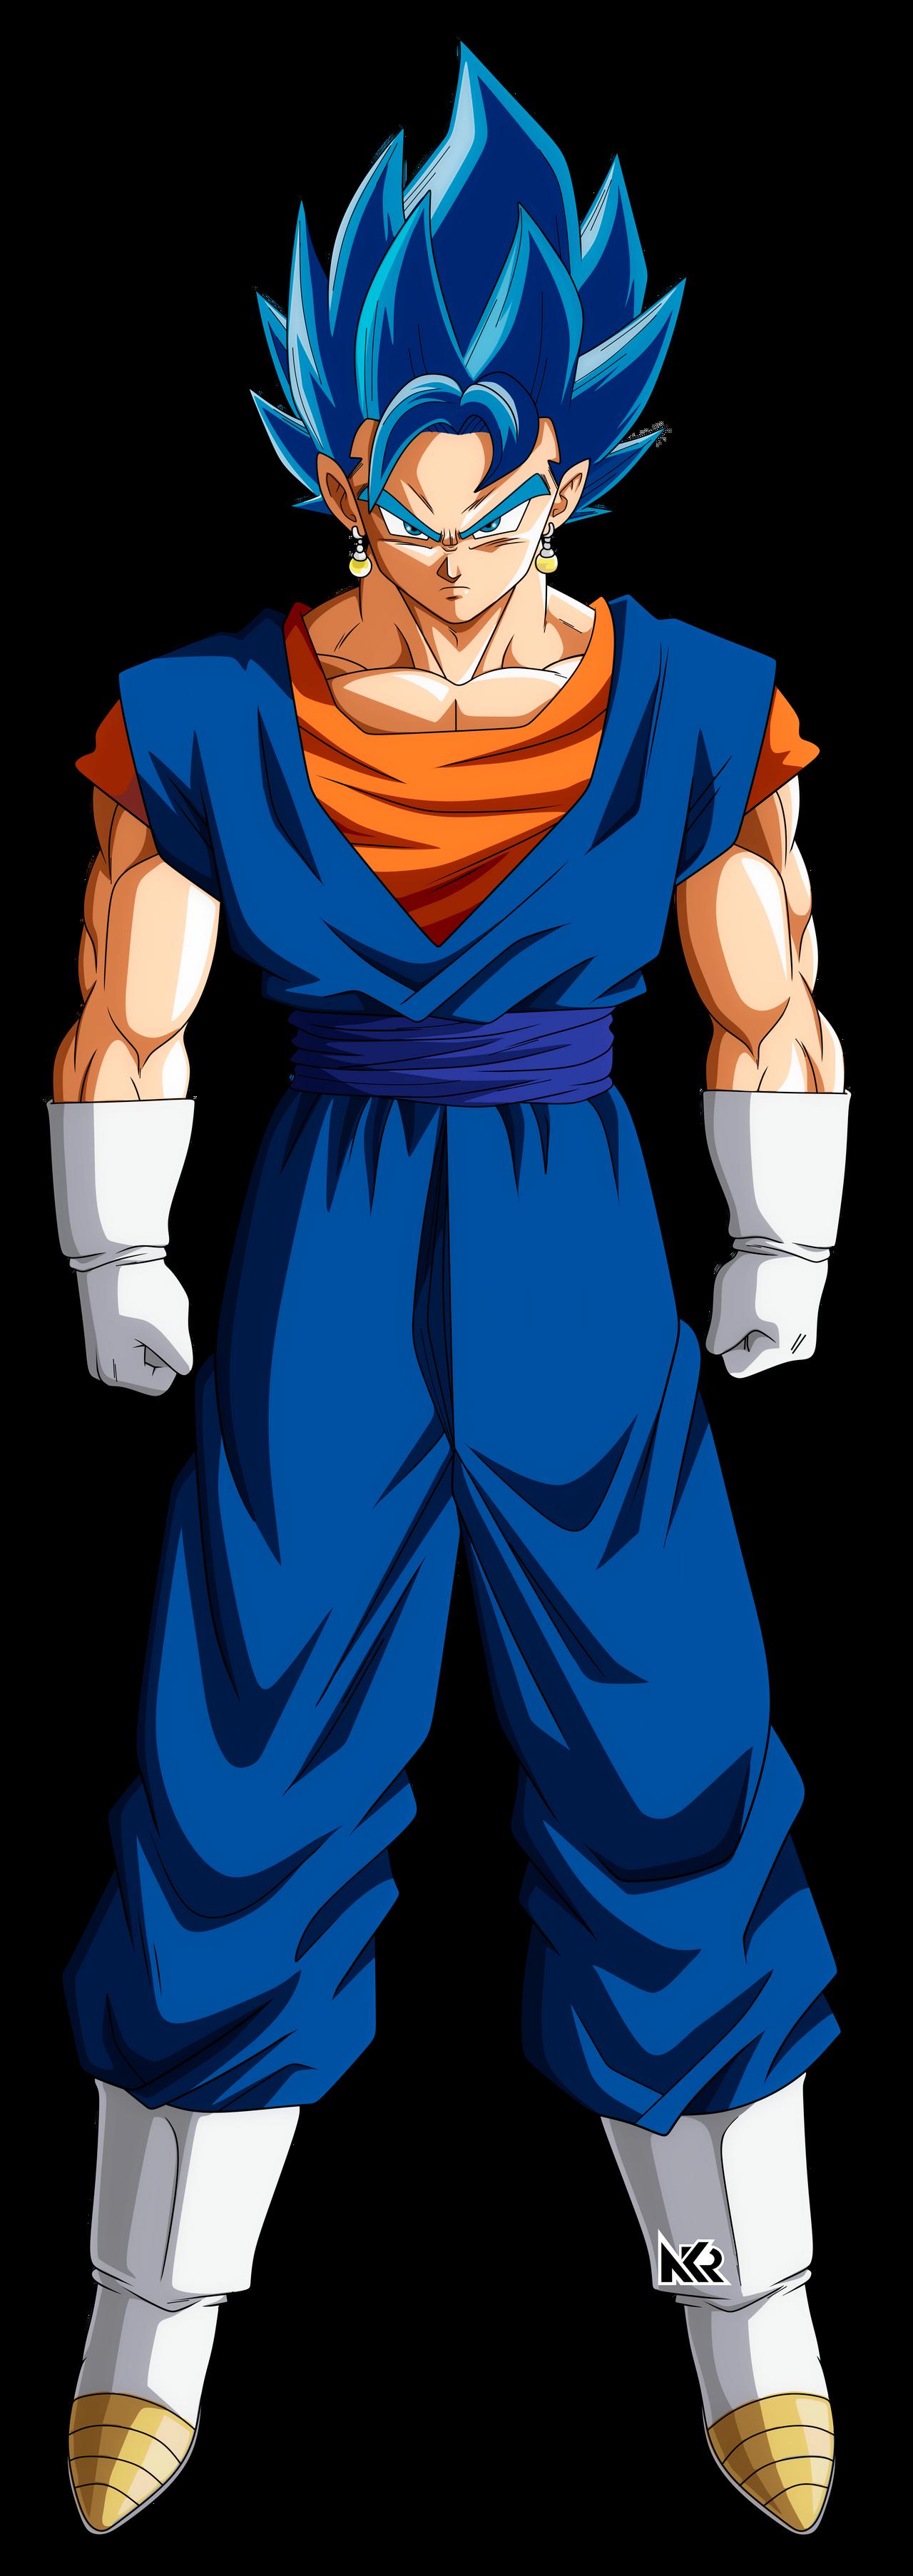 Vegetto Ssj Blue By Naironkr On Deviantart Dragon Ball Image Anime Dragon Ball Super Dragon Ball Artwork